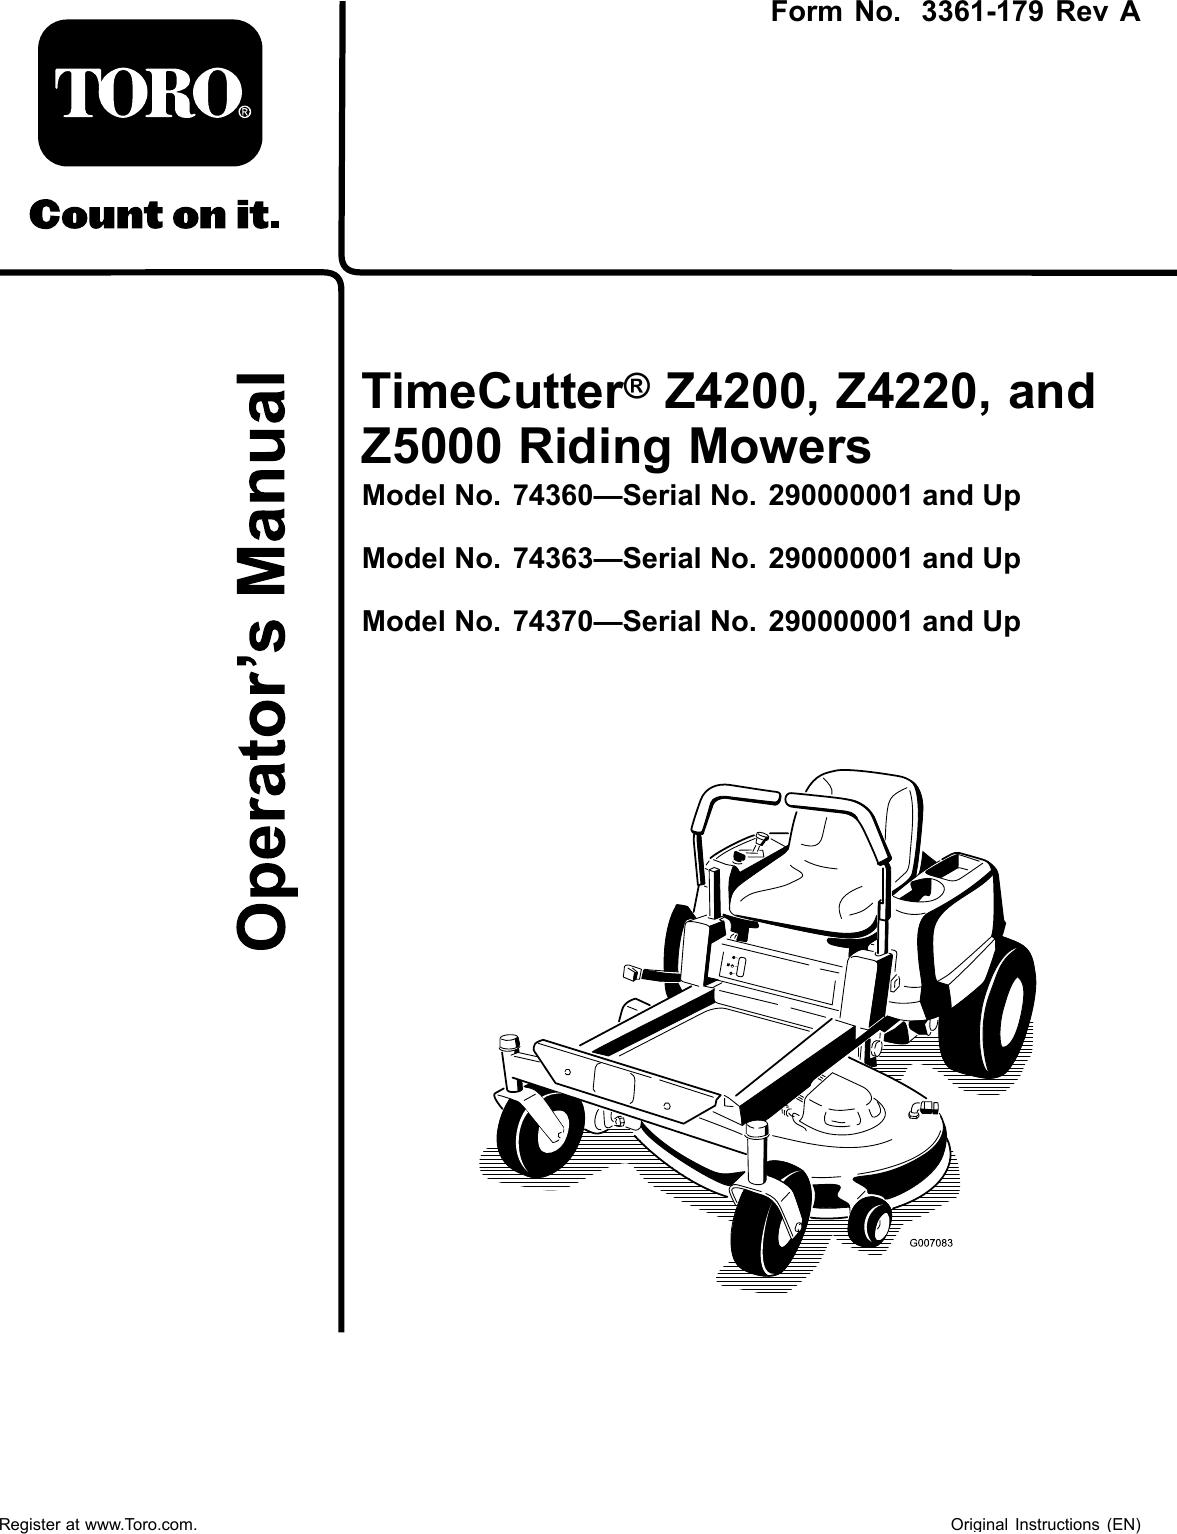 Z4200 Z4220 Man on toro timecutter z5060 starter parts, kubota ignition switch wiring diagram, toro timecutter diagram, toro 74370 parts model, wheel horse drive belt diagram, toro deck belt diagram, toro timecutter 5000 parts,